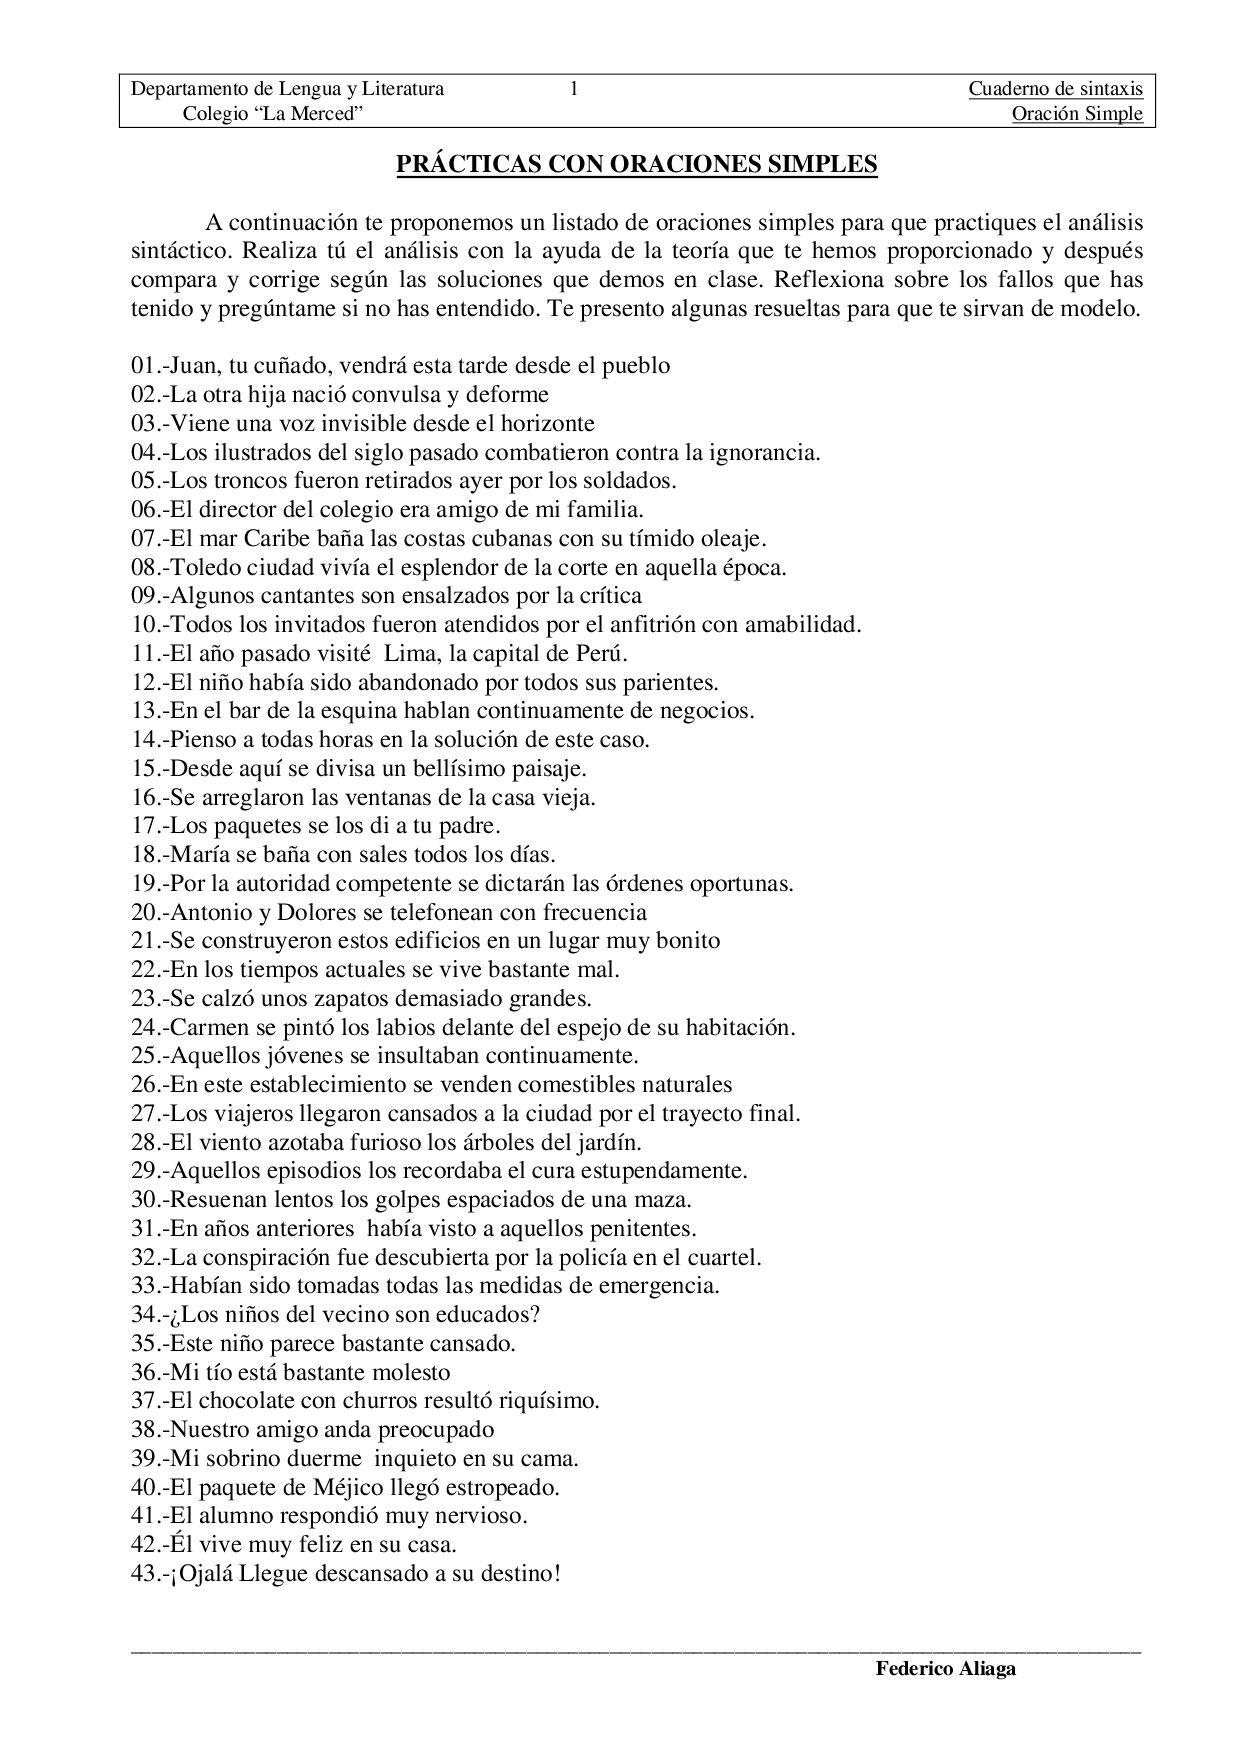 Oraciones Simples Analizadas By Ana Belen Issuu